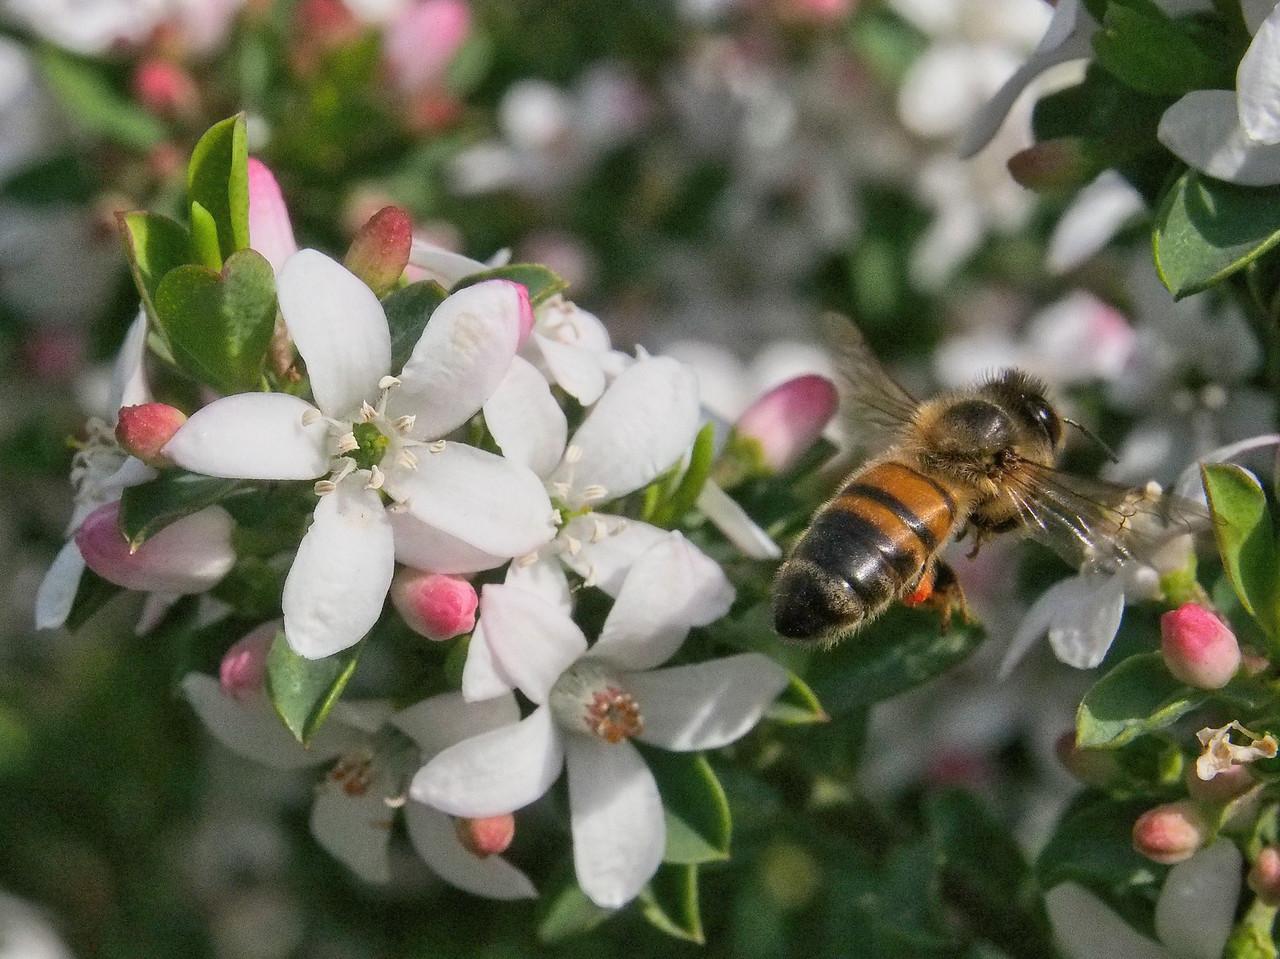 20130901_1217_1700 Kew Baptist bee